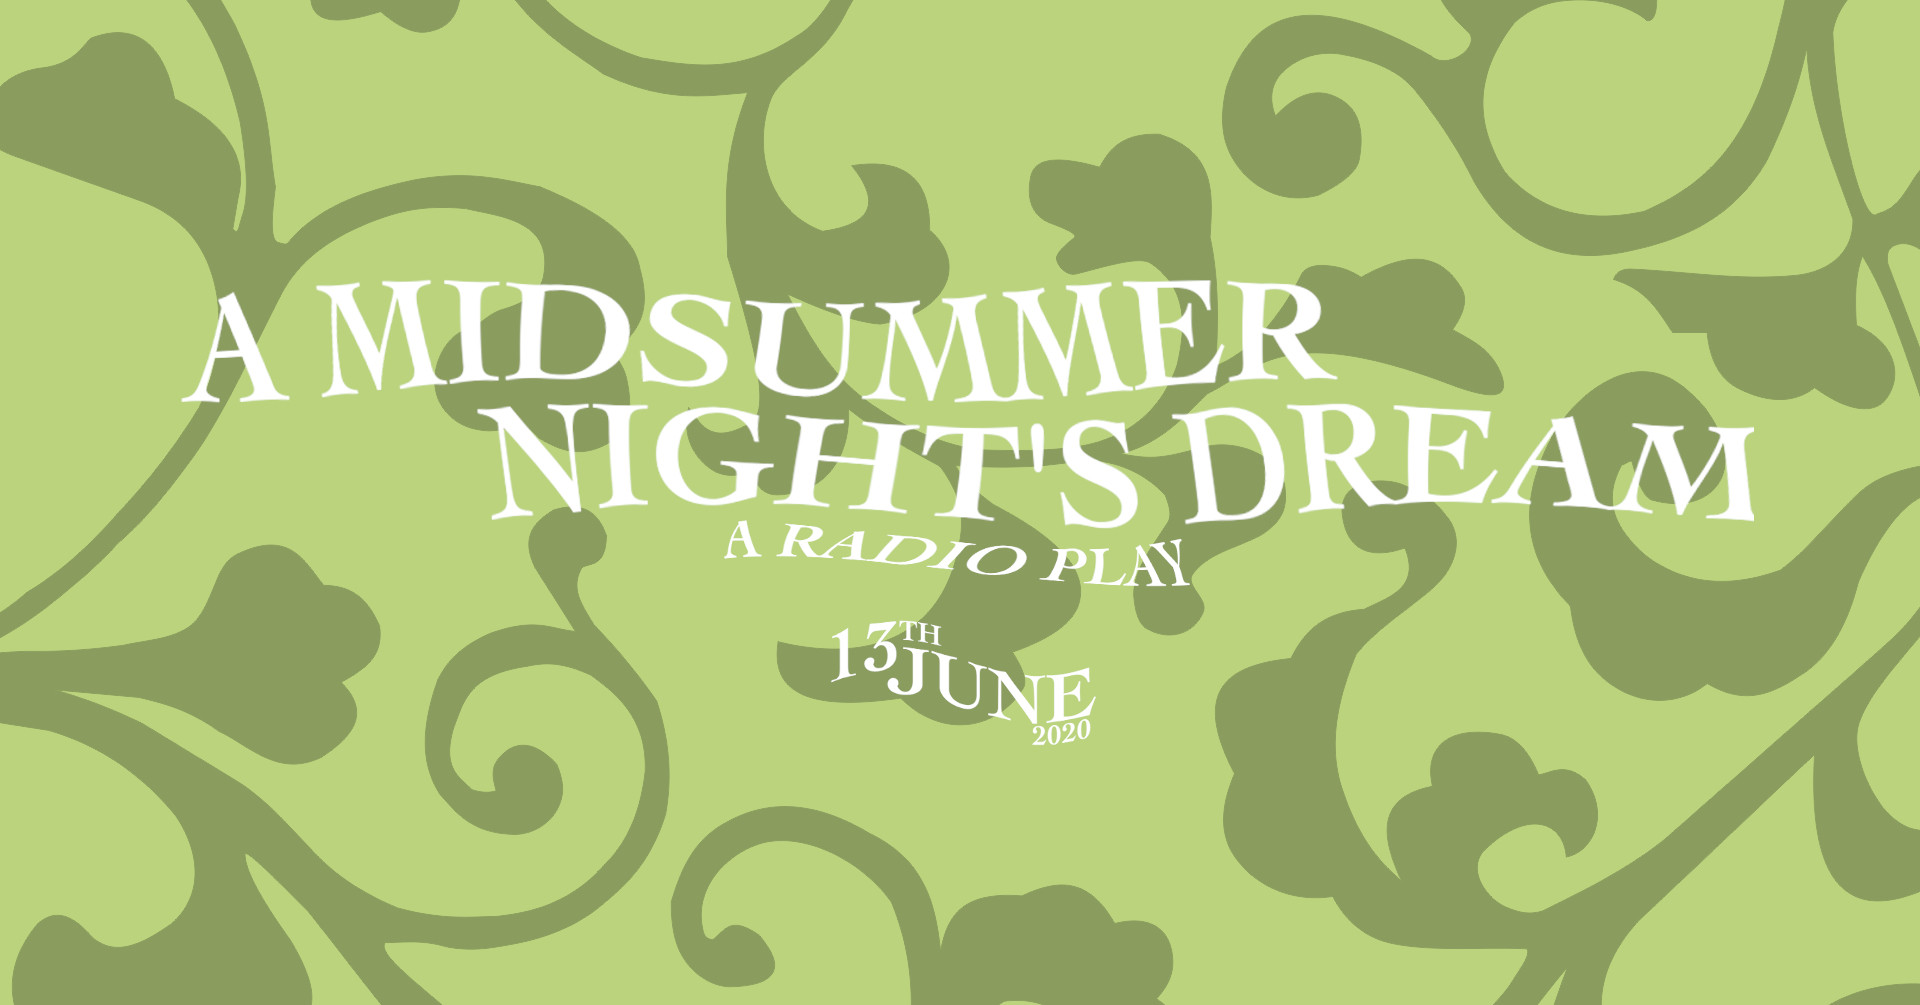 A Midsummer Night's Dream, now LIVE